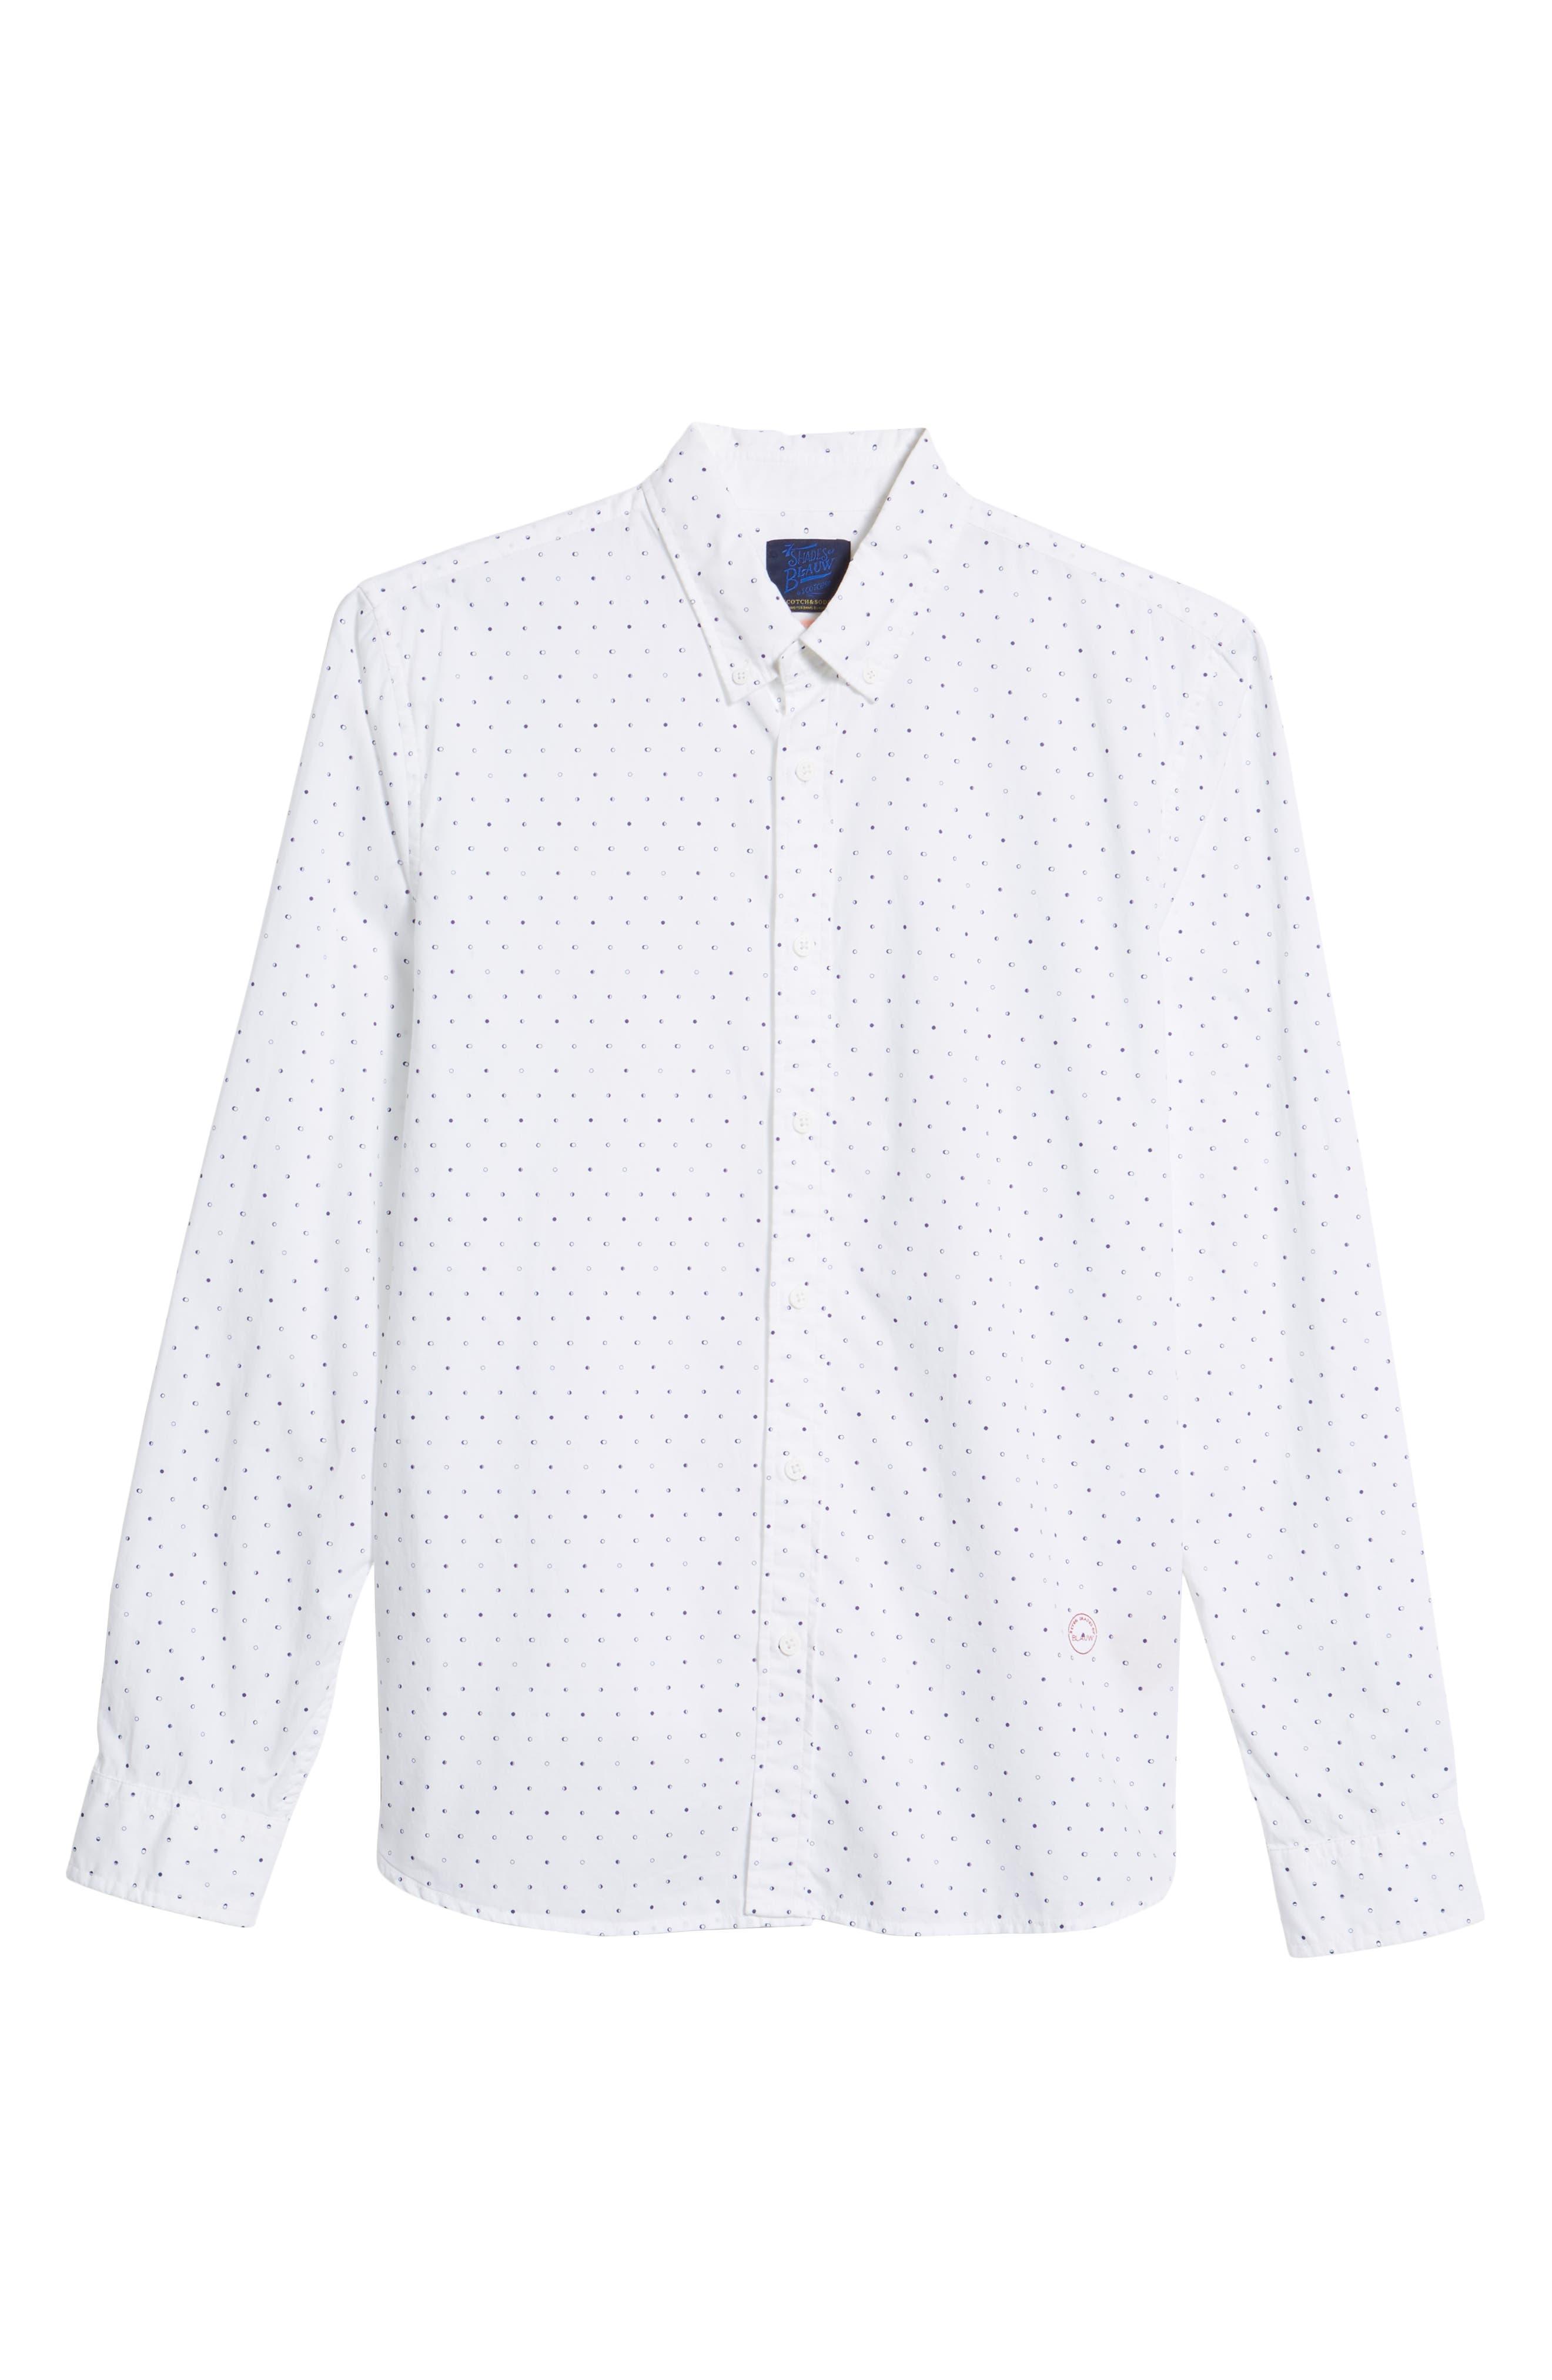 Amsterdams Blauw Simple Light Print Sport Shirt,                             Alternate thumbnail 6, color,                             110